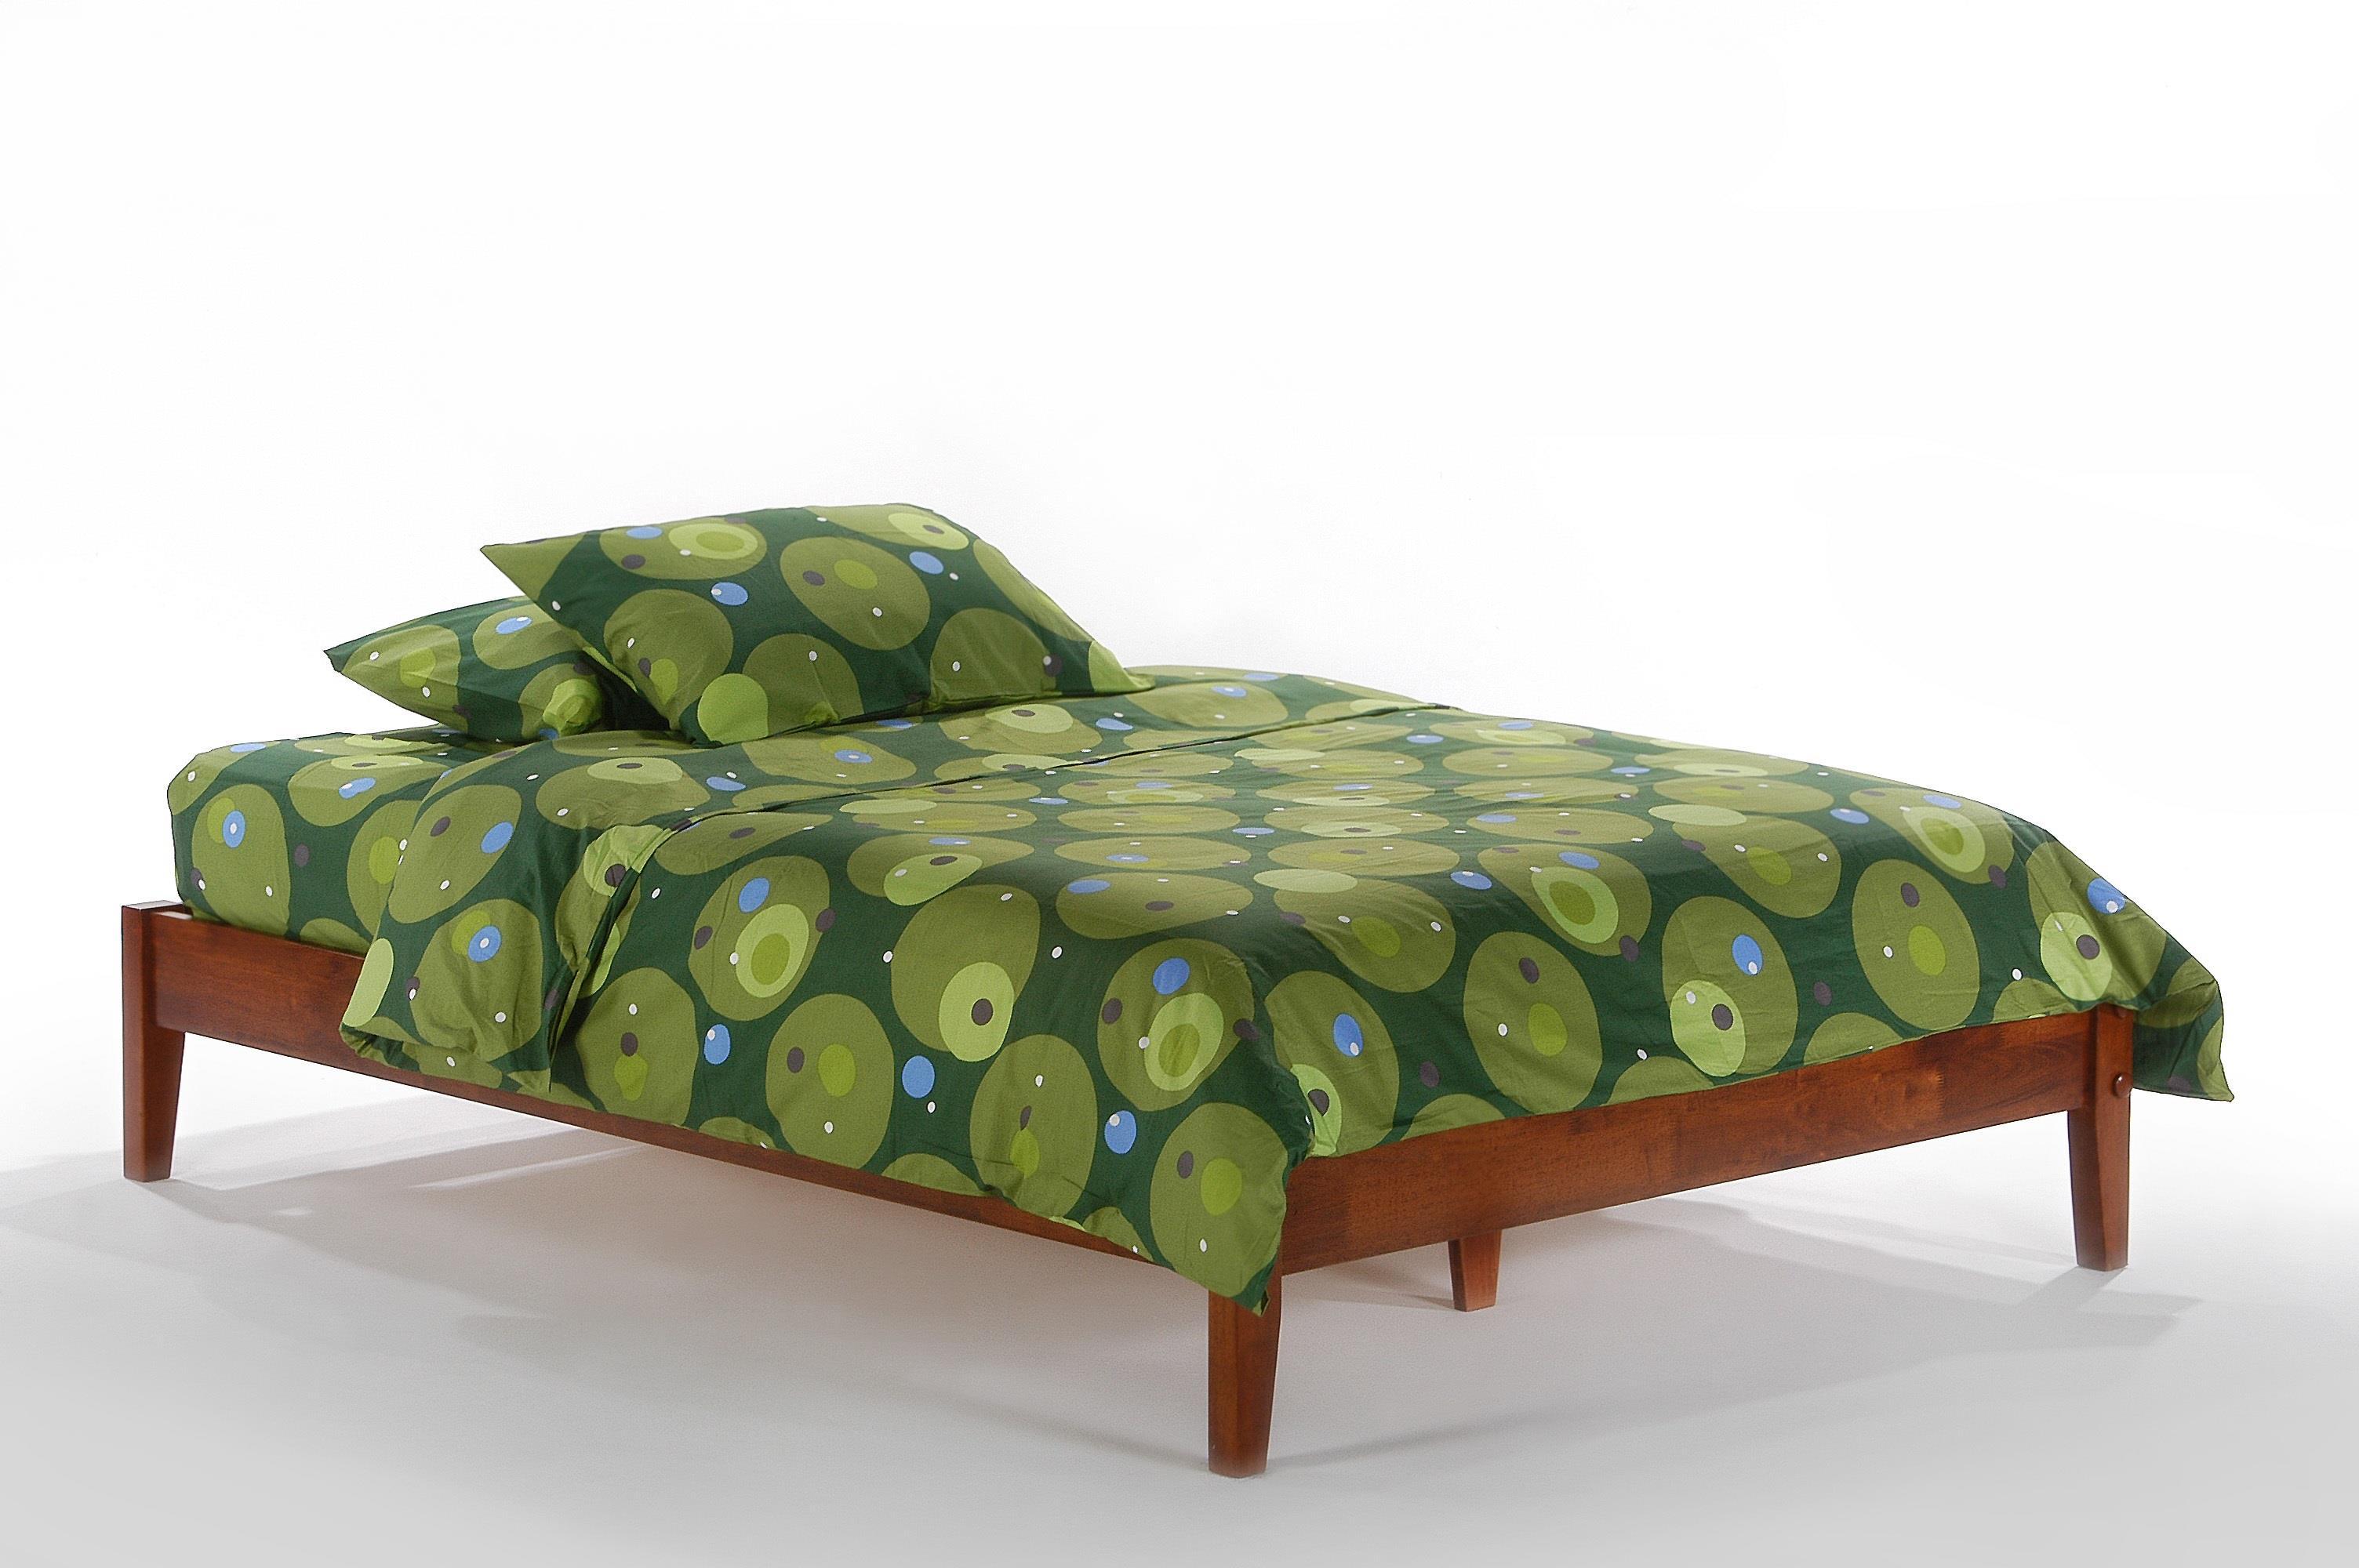 Sage King Bed by Pacific Manufacturing at SlumberWorld